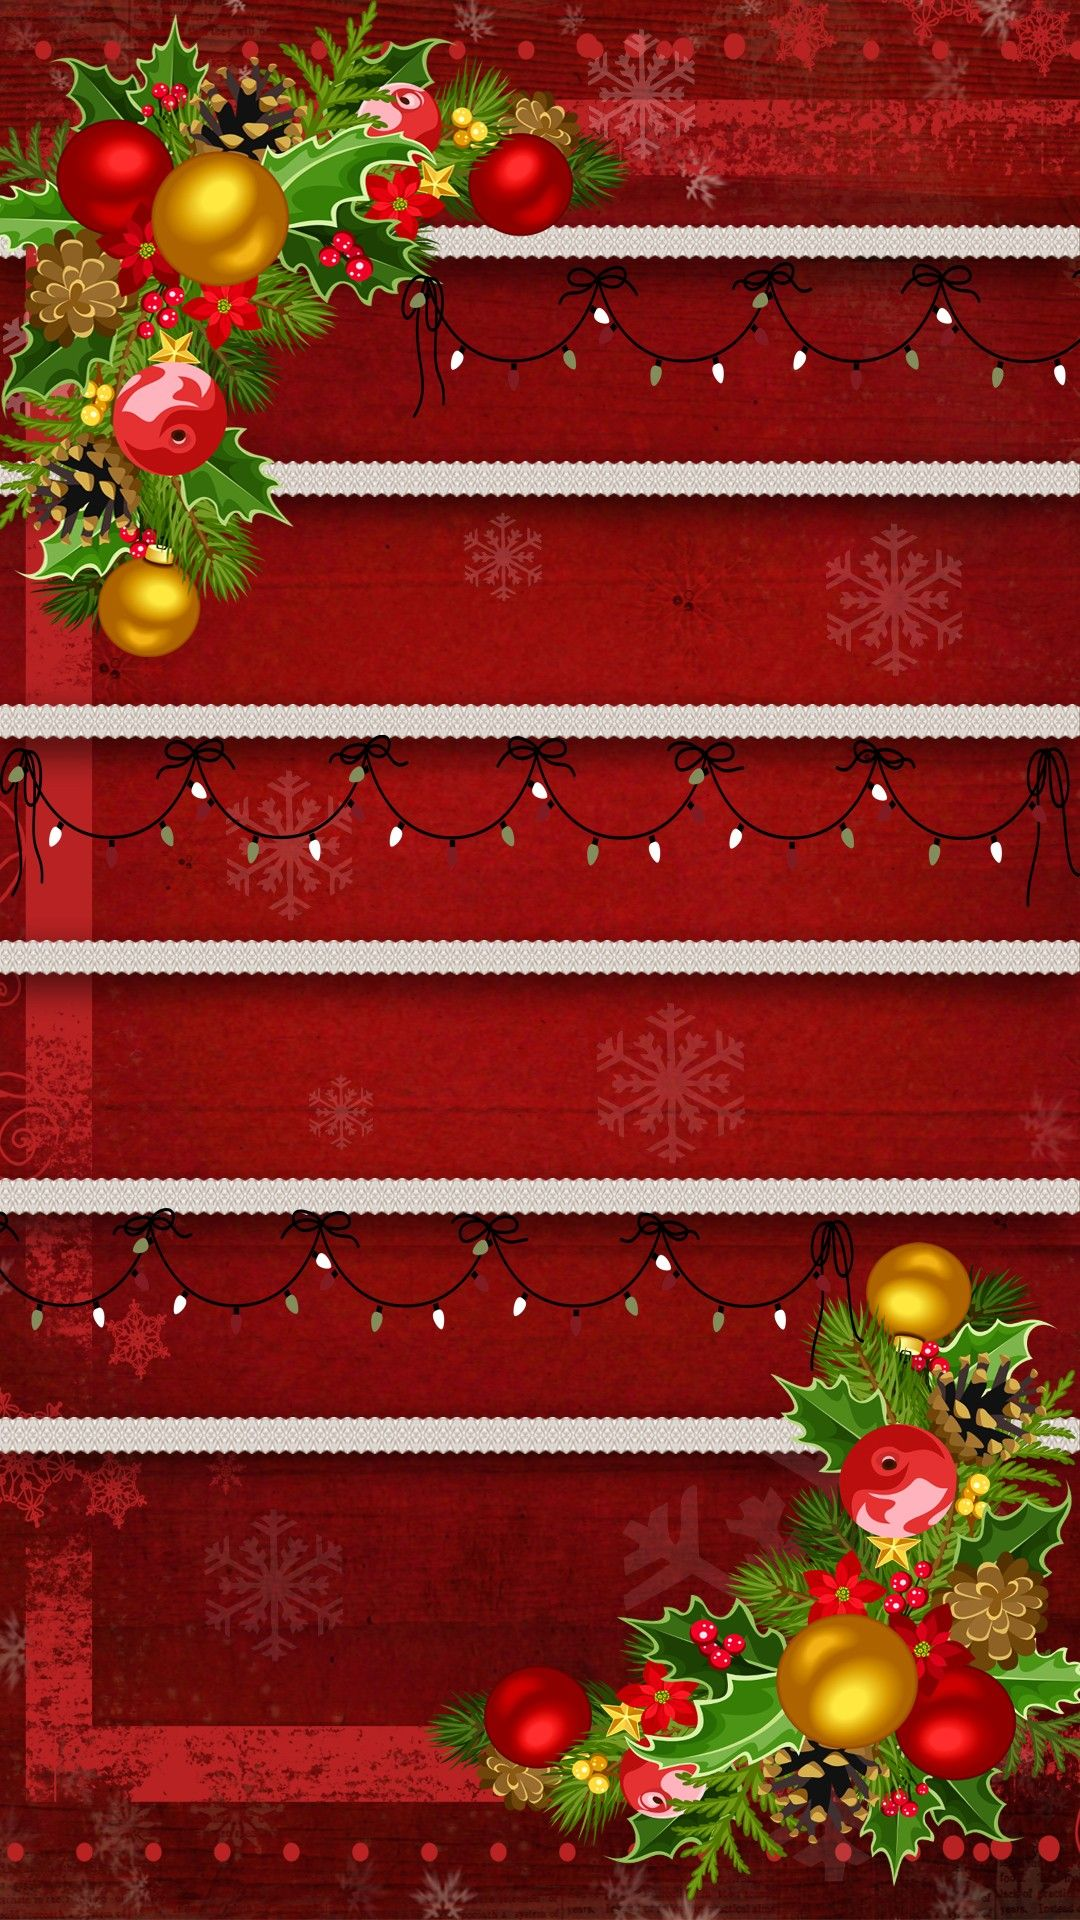 Iphone Christmas Design Studio Christmas Wallpaper Christmas Background Christmas Layouts